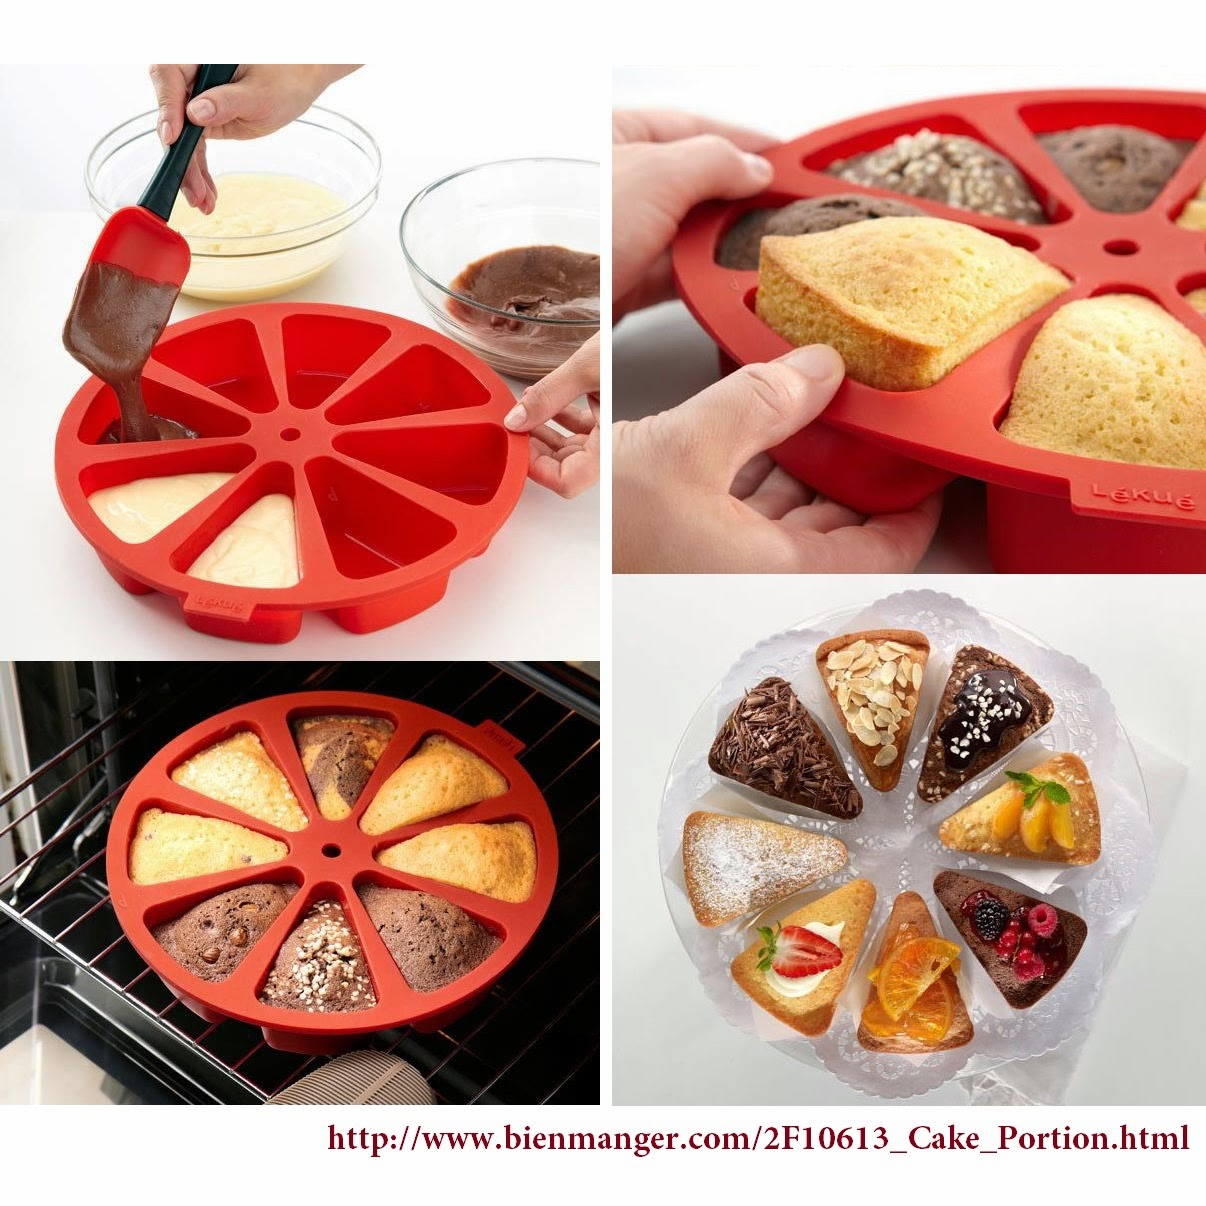 http://www.bienmanger.com/2F10613_Cake_Portion.html